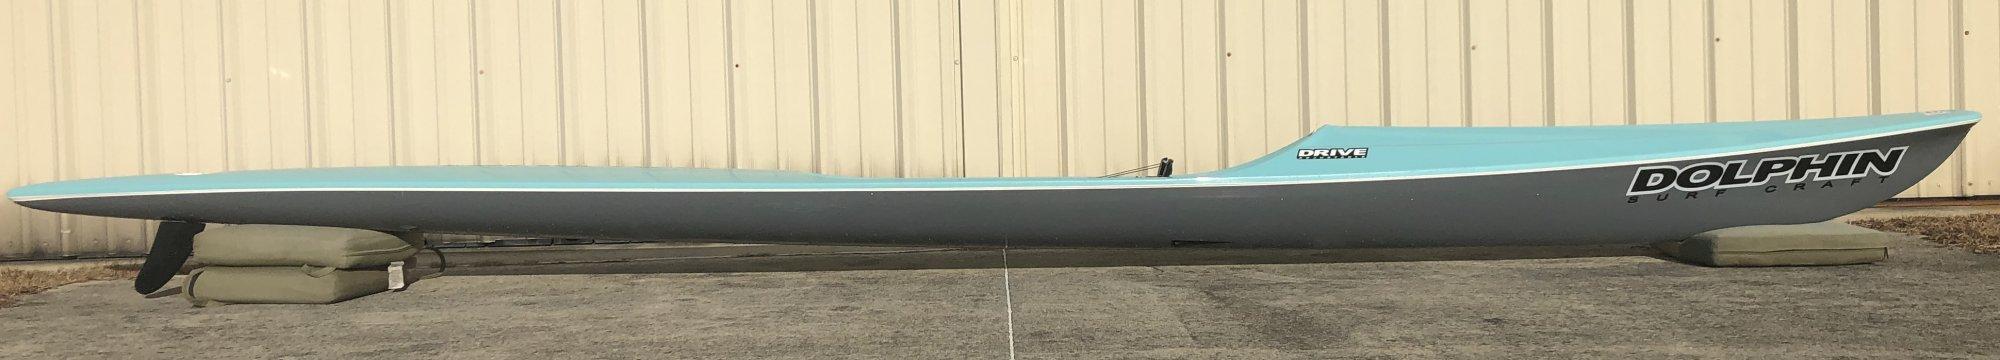 Dolphin Adjustable Drive II Surf Ski 19' - Demo 1036